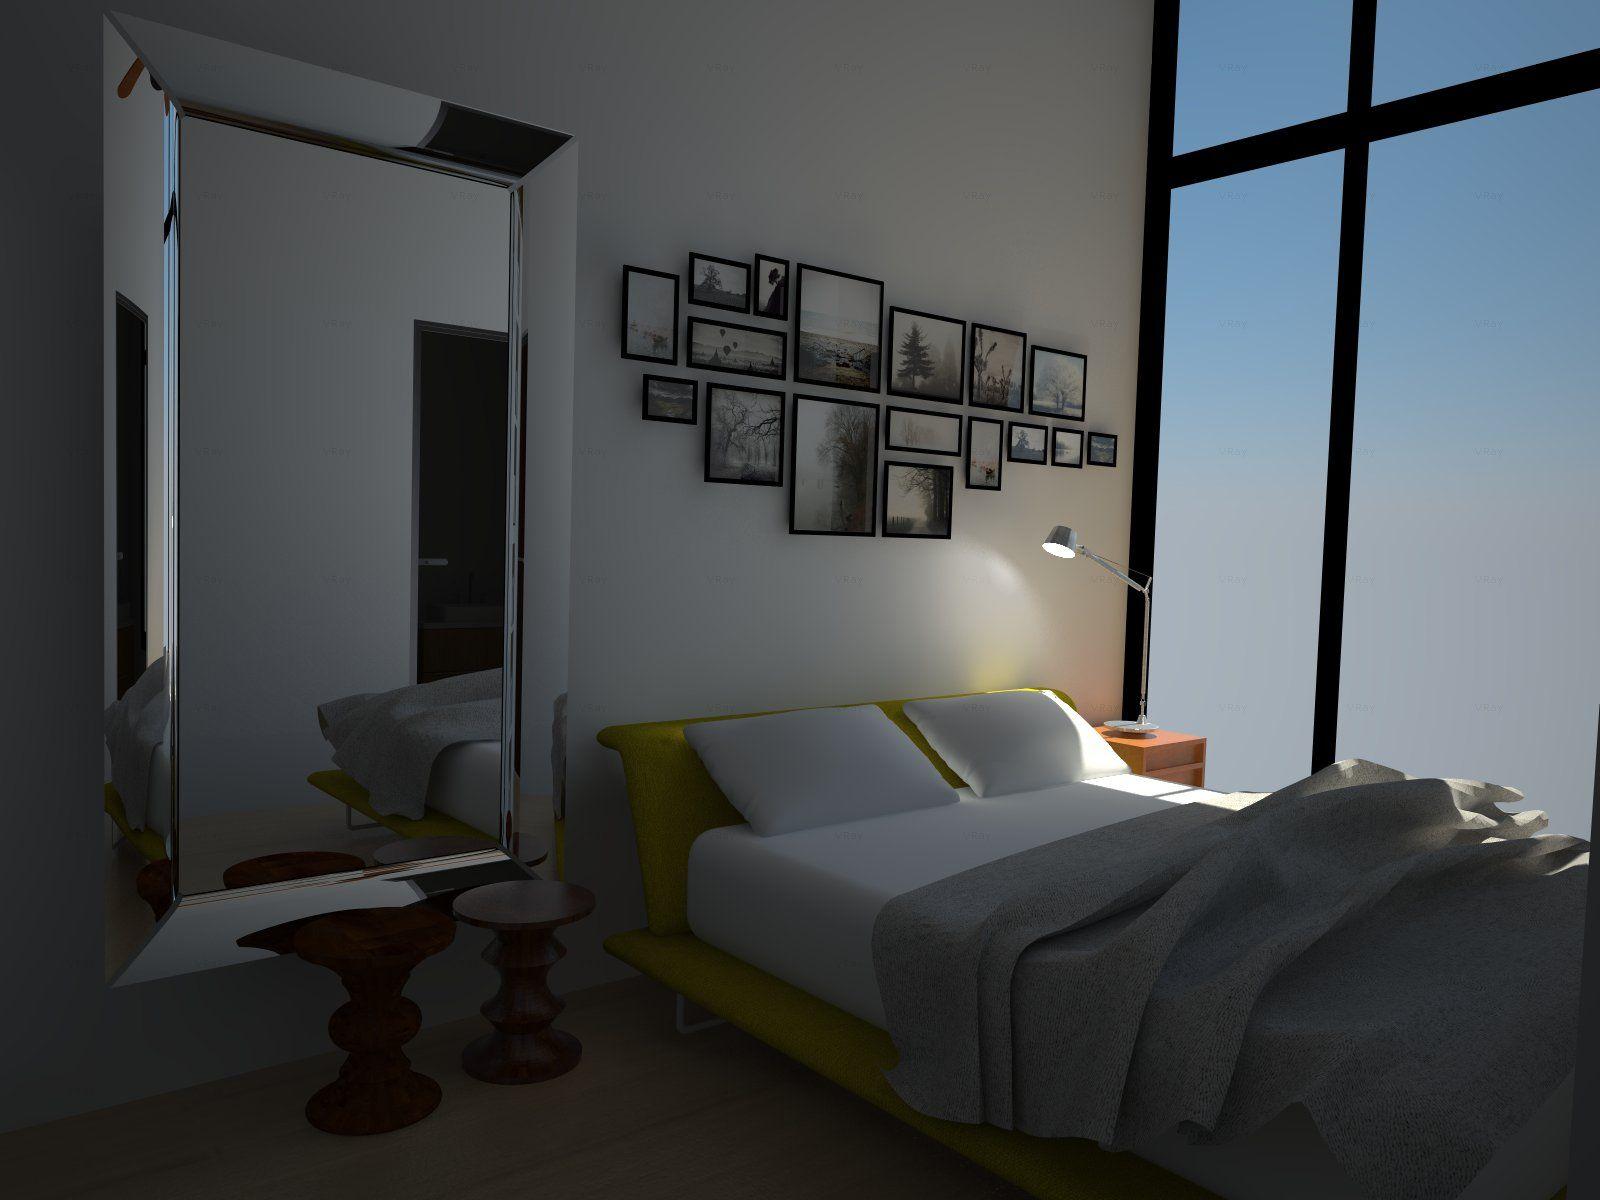 Loft apartment in kuala lumpur malaysia. the establishment which is